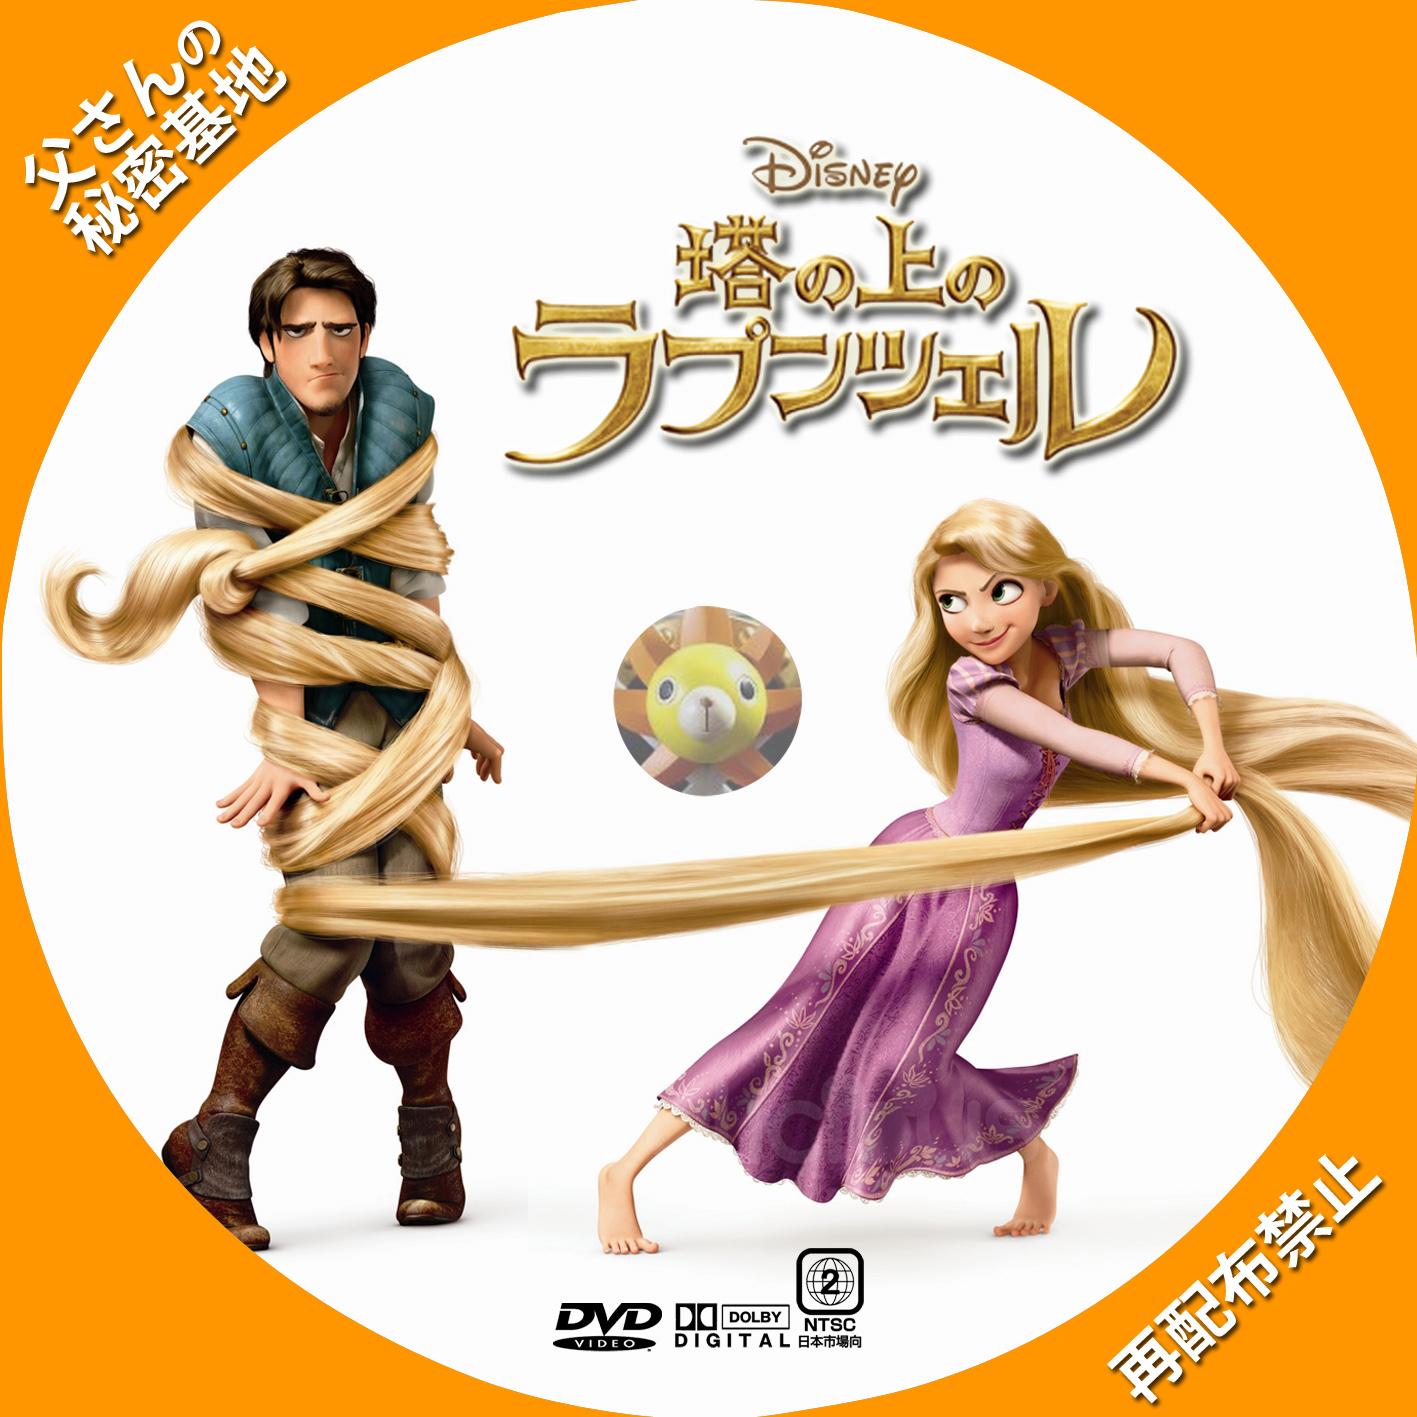 rapunzel_DVD_02.jpg